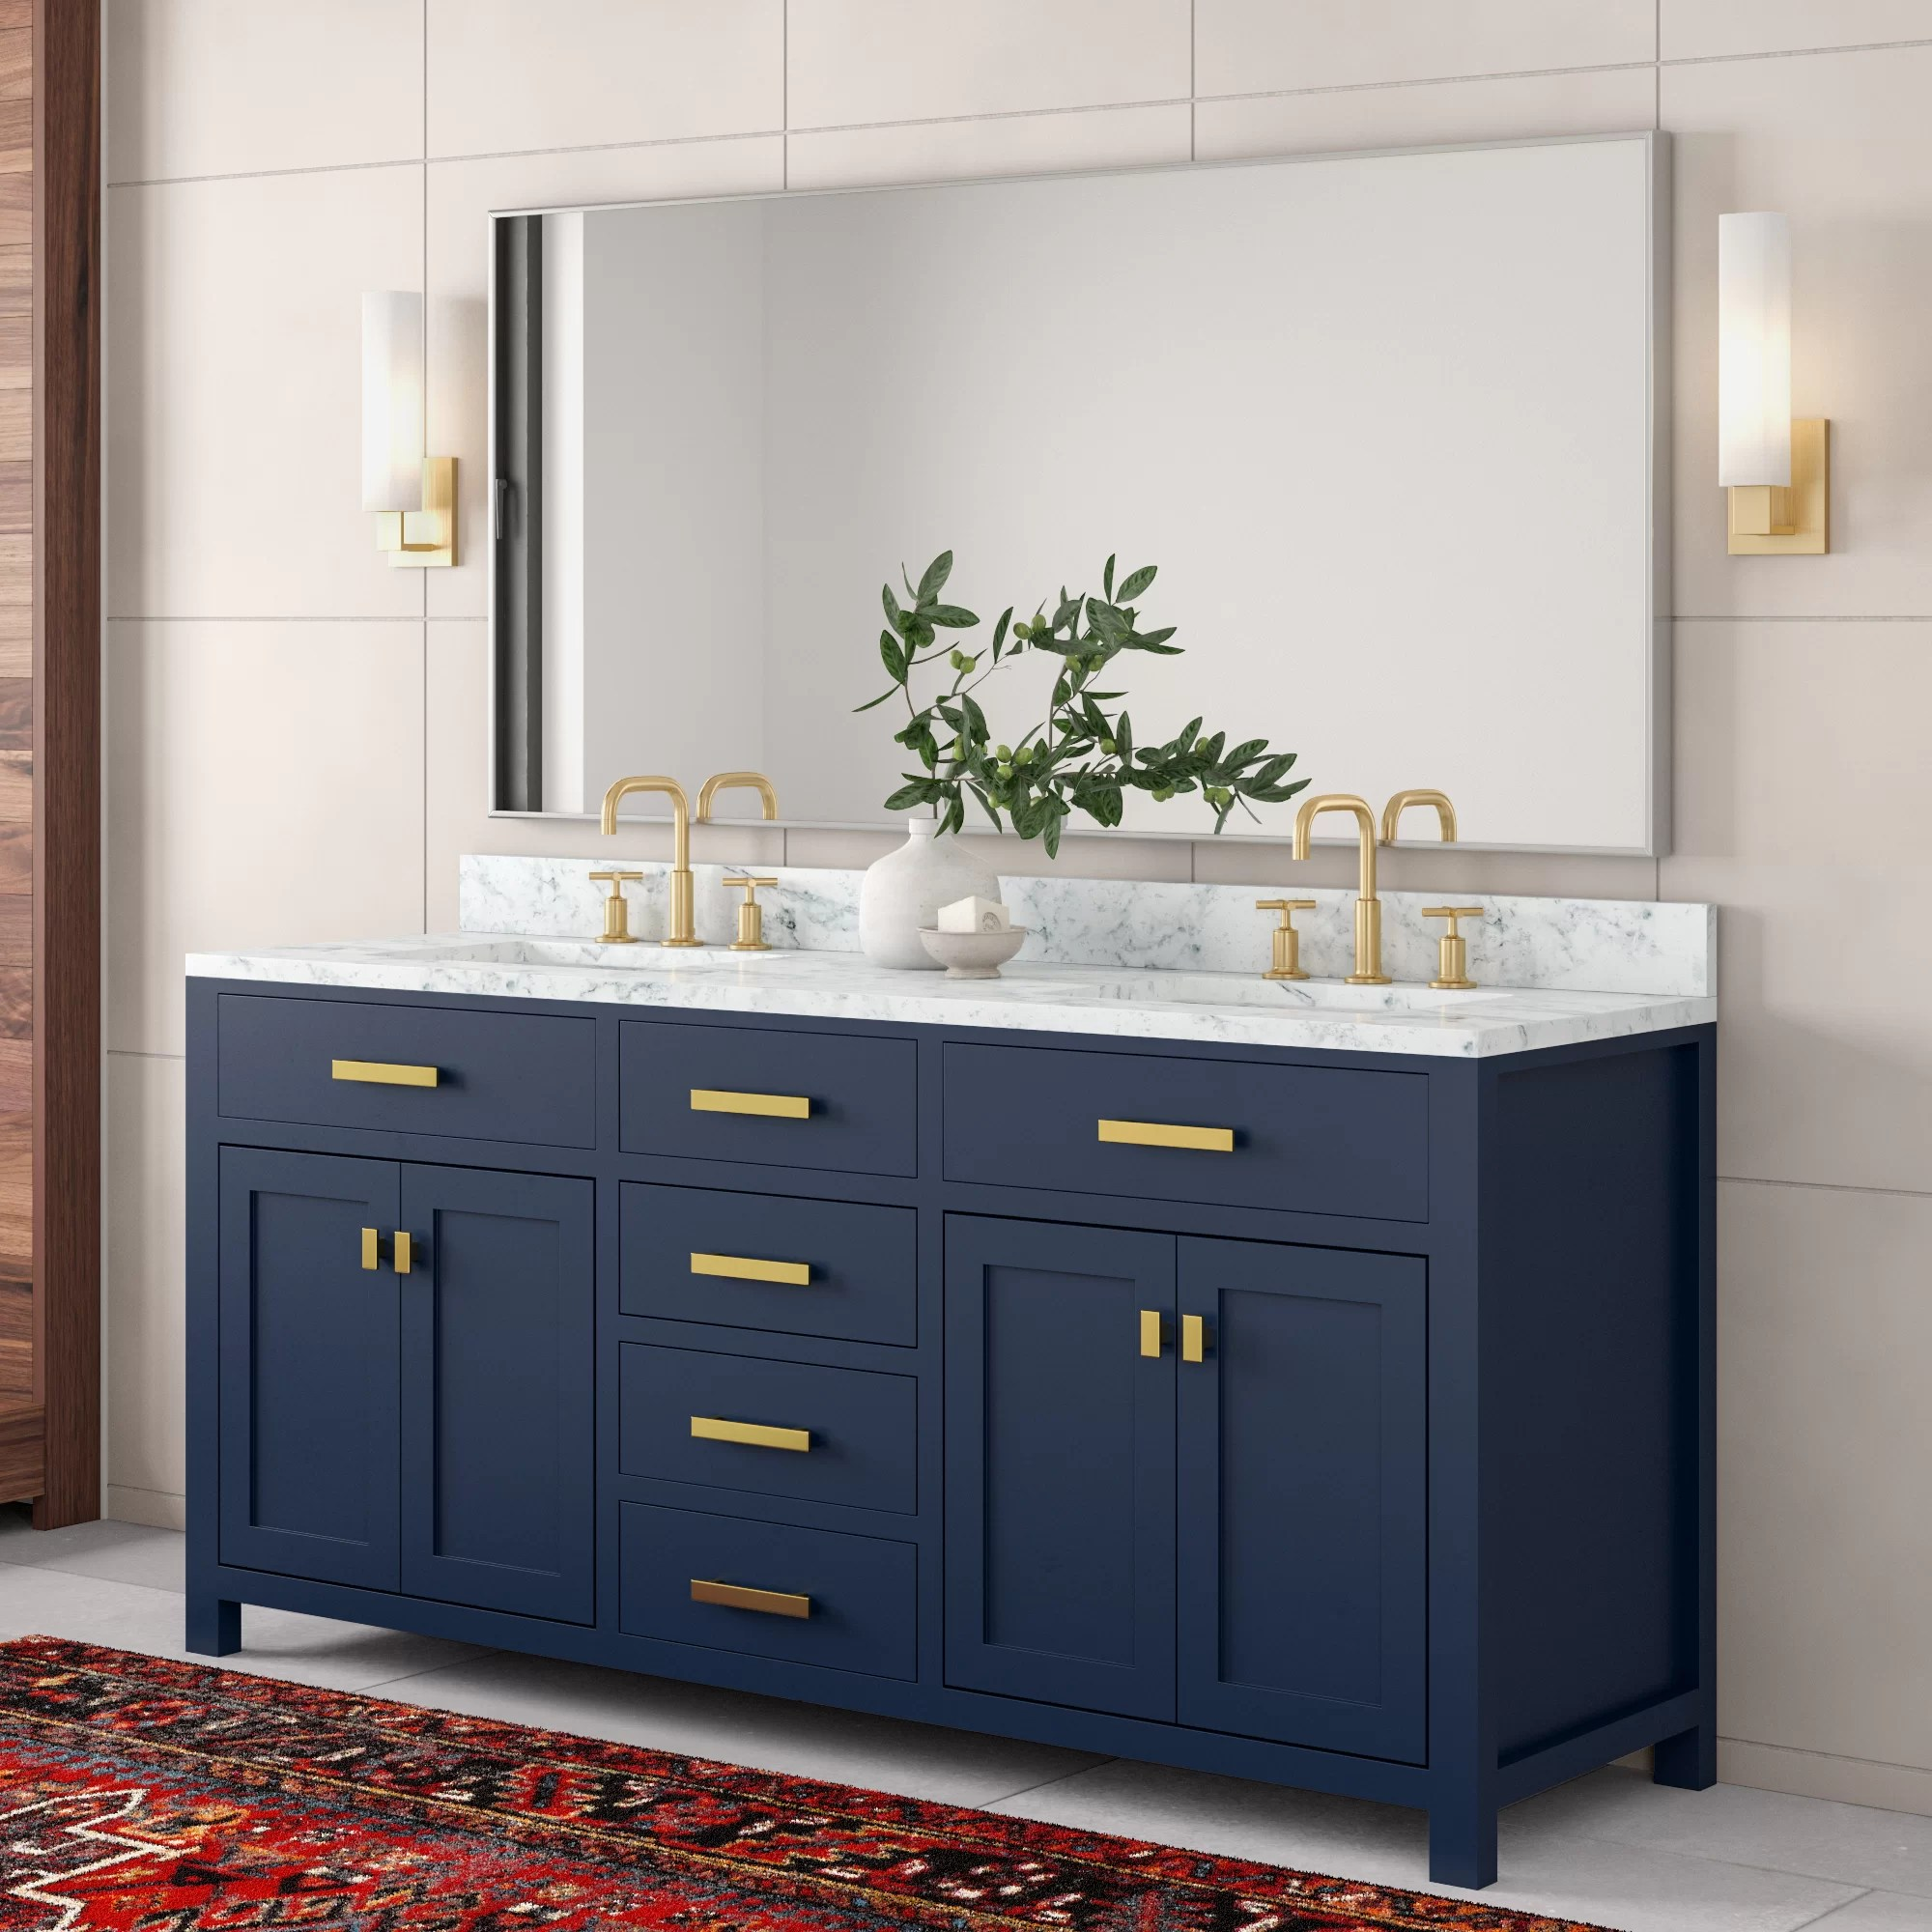 Rachelle 72 Double Bathroom Vanity Set Reviews Allmodern